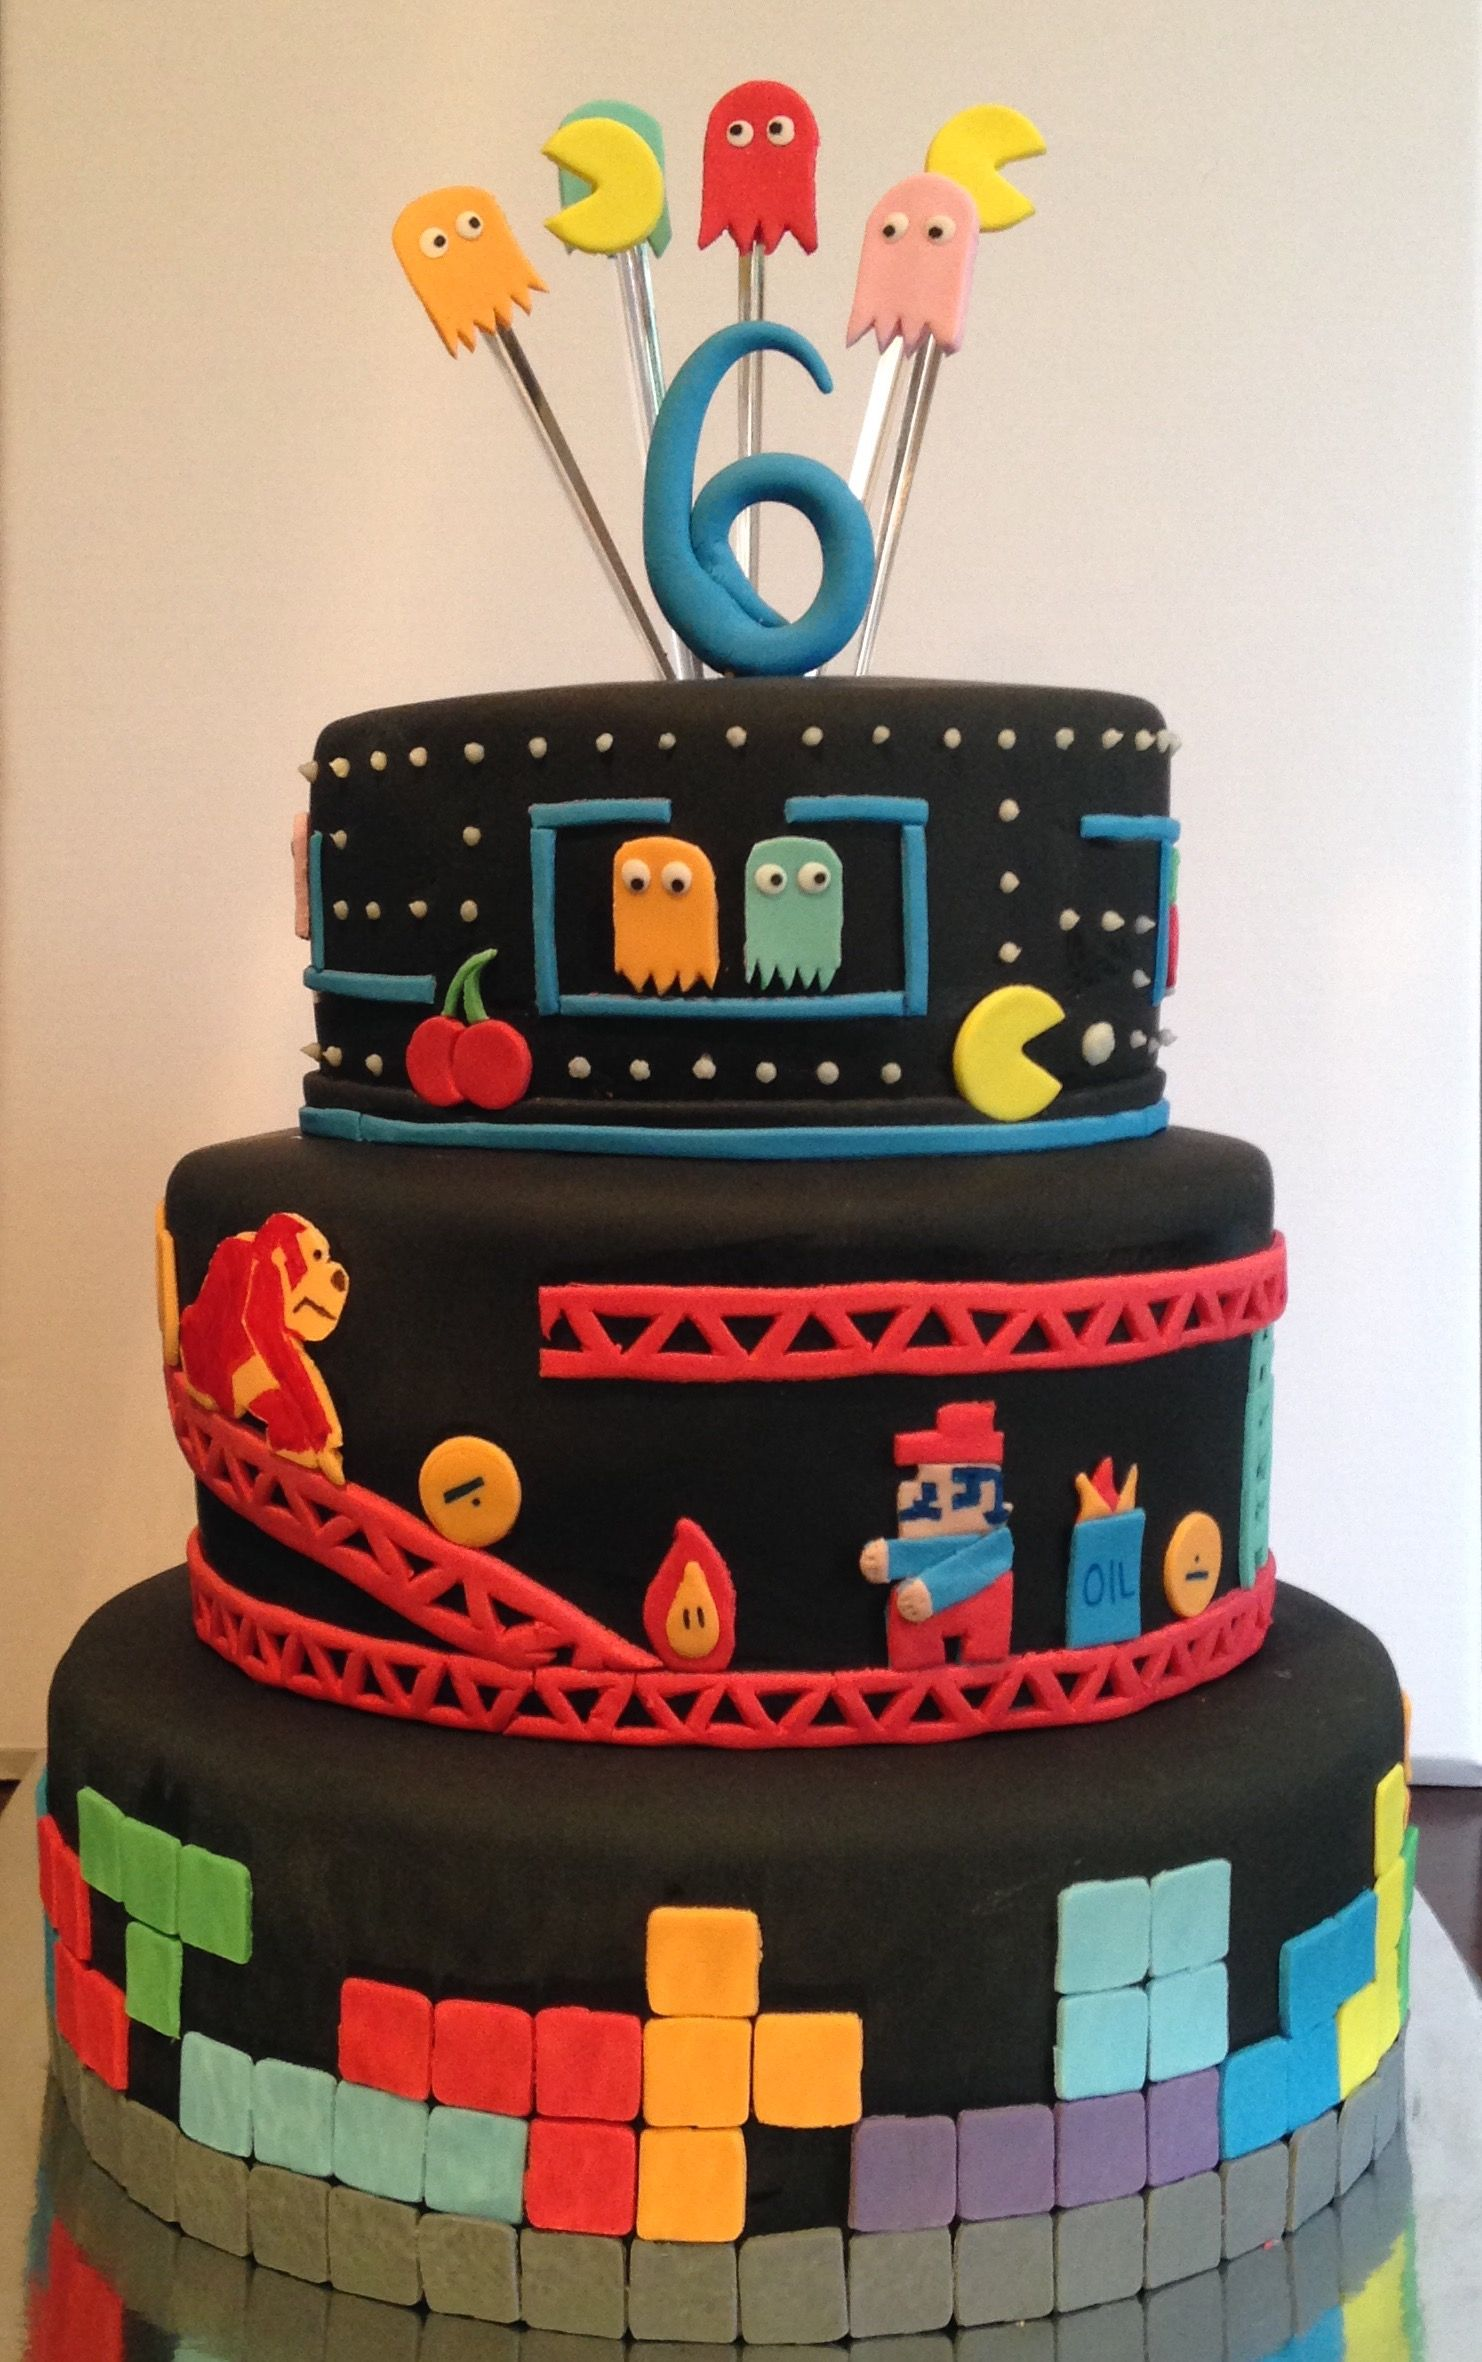 Gaming Cake Nintendo Mario Donkey Kong Tetris Cakes N Mora - Tetris birthday cake